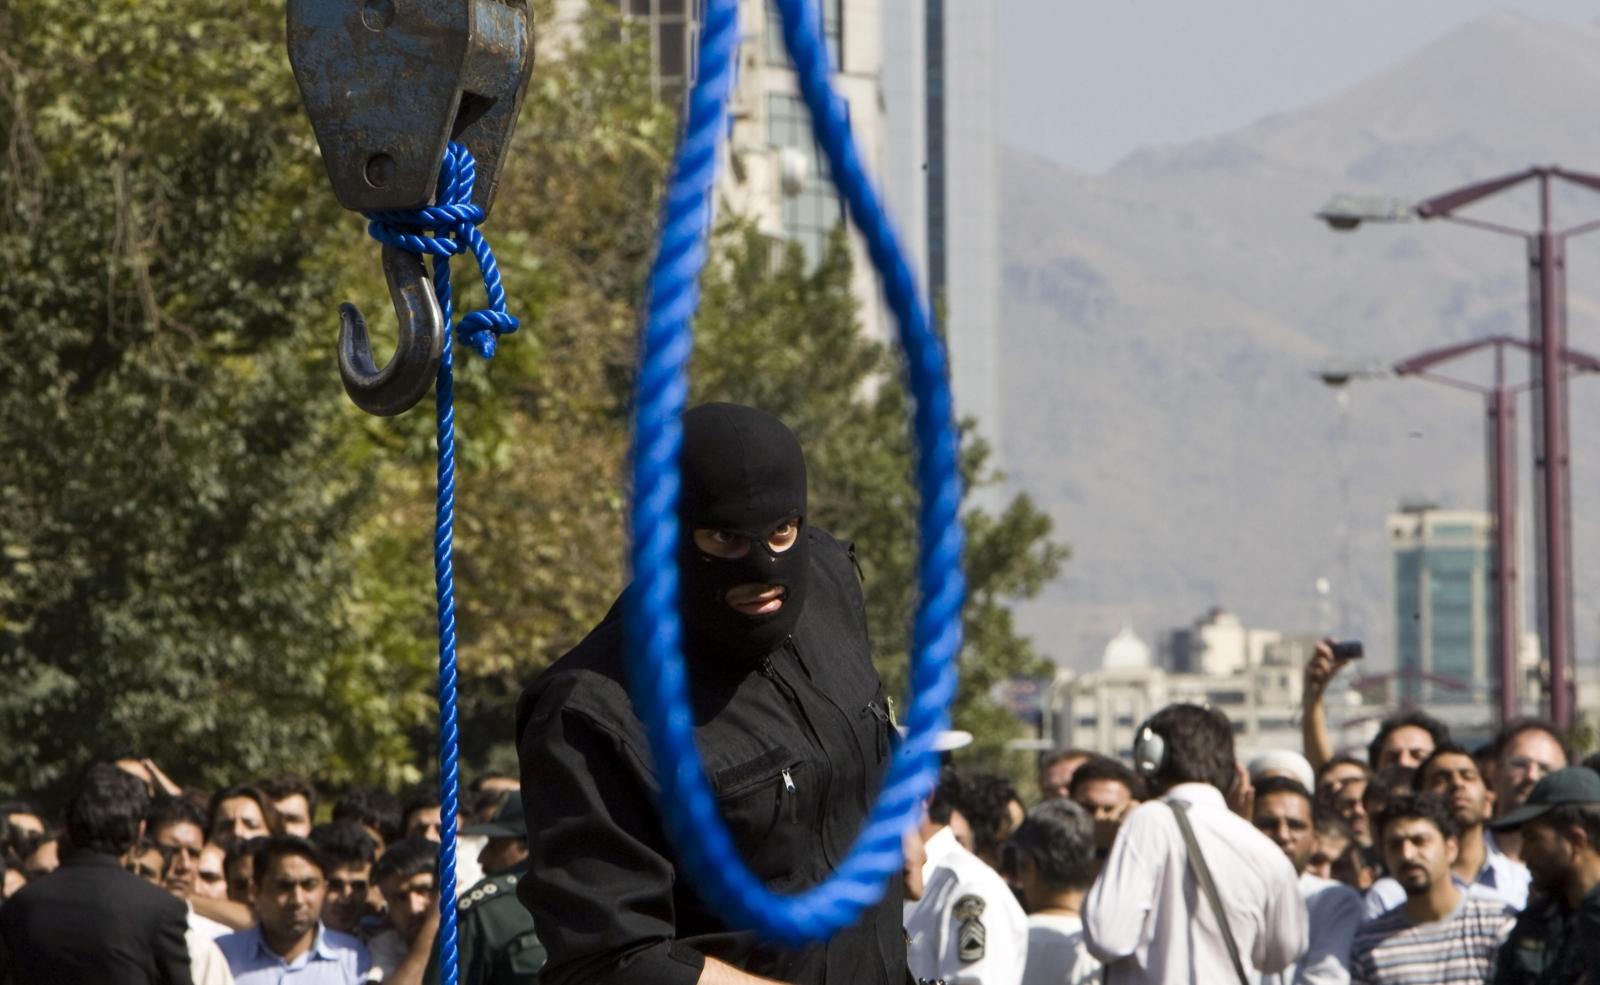 Altı defa alkol içme suçu içleyen adam idam İran'da idam edildi